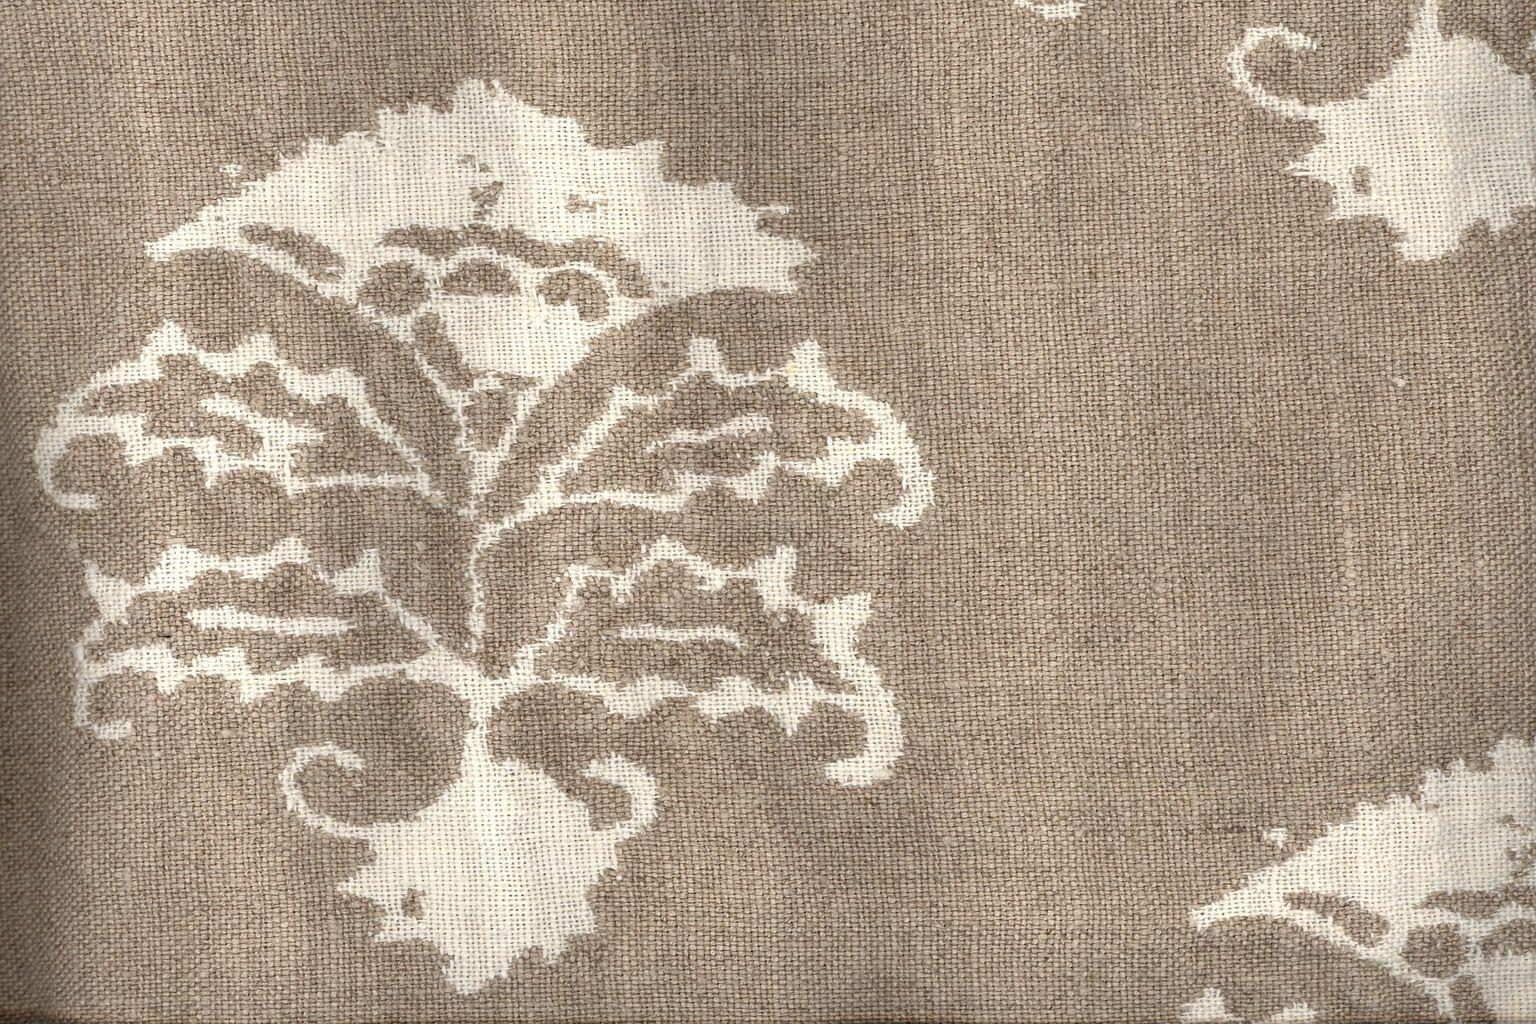 Pienza Cardo in Bianco/Naturale from C&C Milano #neutral #floral #linen #textiles #fabric #interiordesign #designinspiration #thetextilefiles #clothandkindinteriordesign #ccmilano